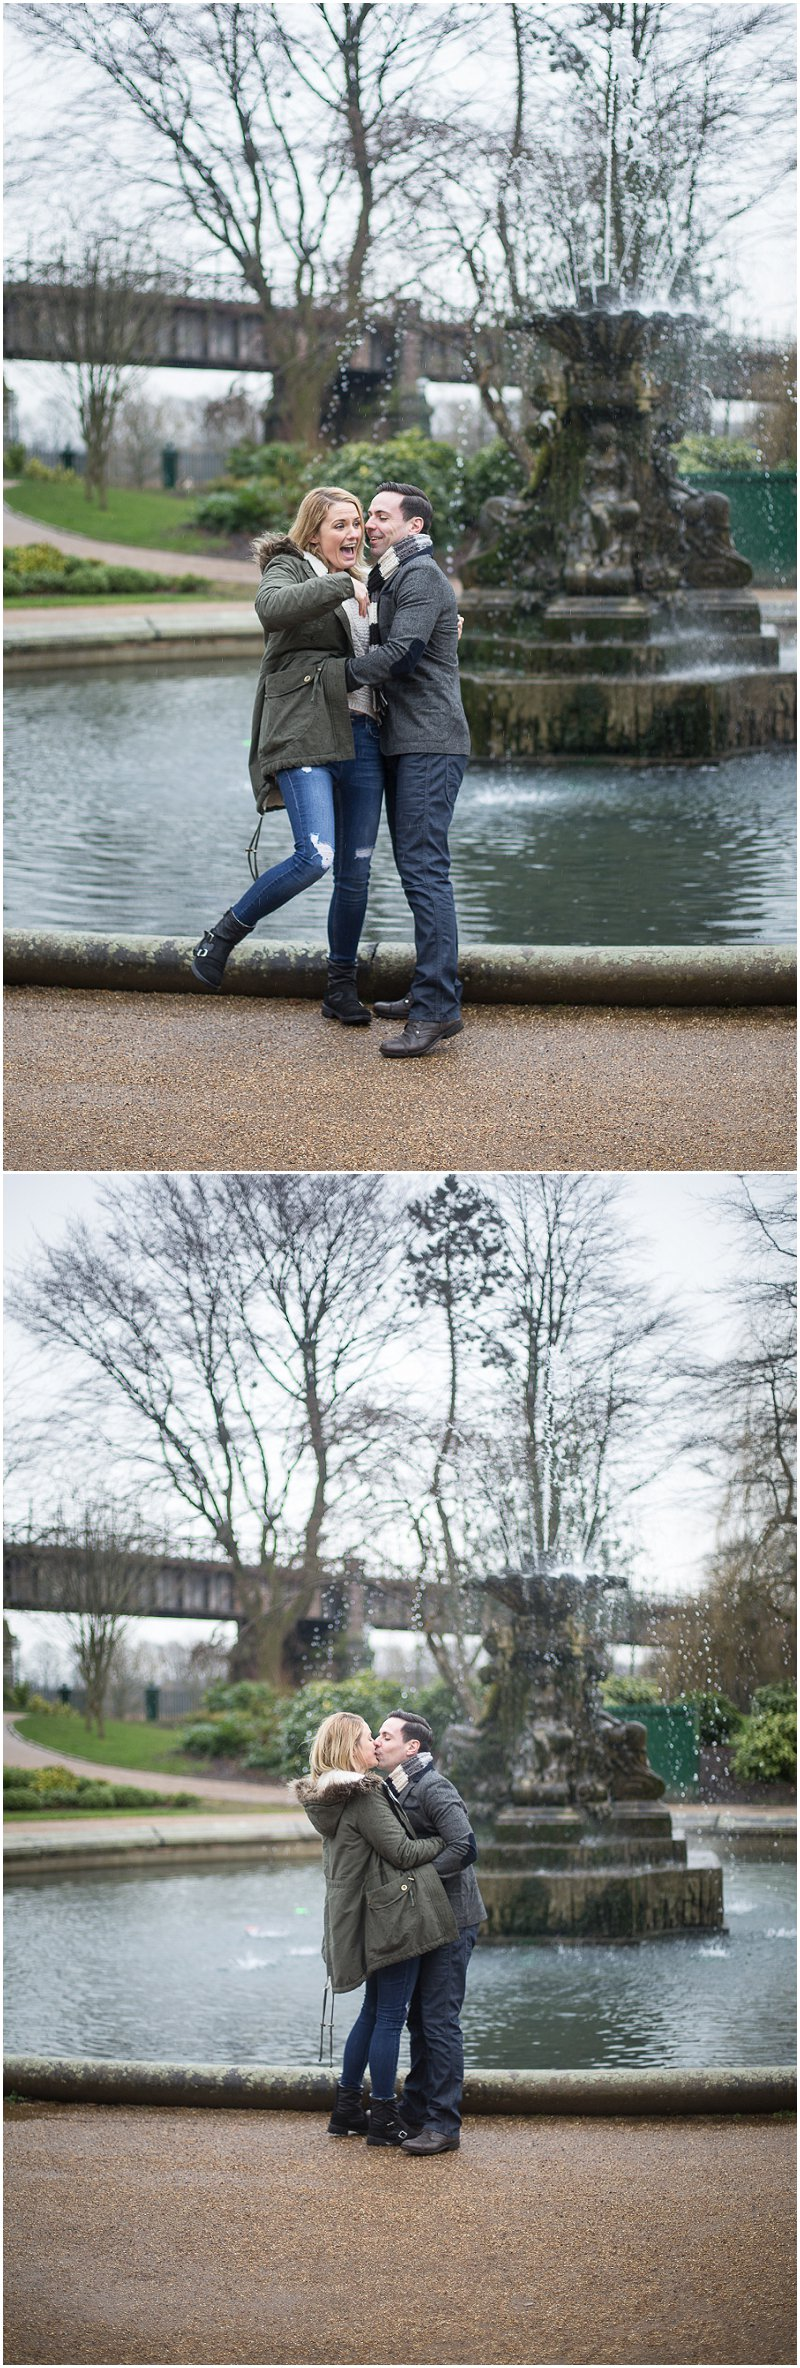 Funny Moment as couple embrace near Fountain, Avenham Park